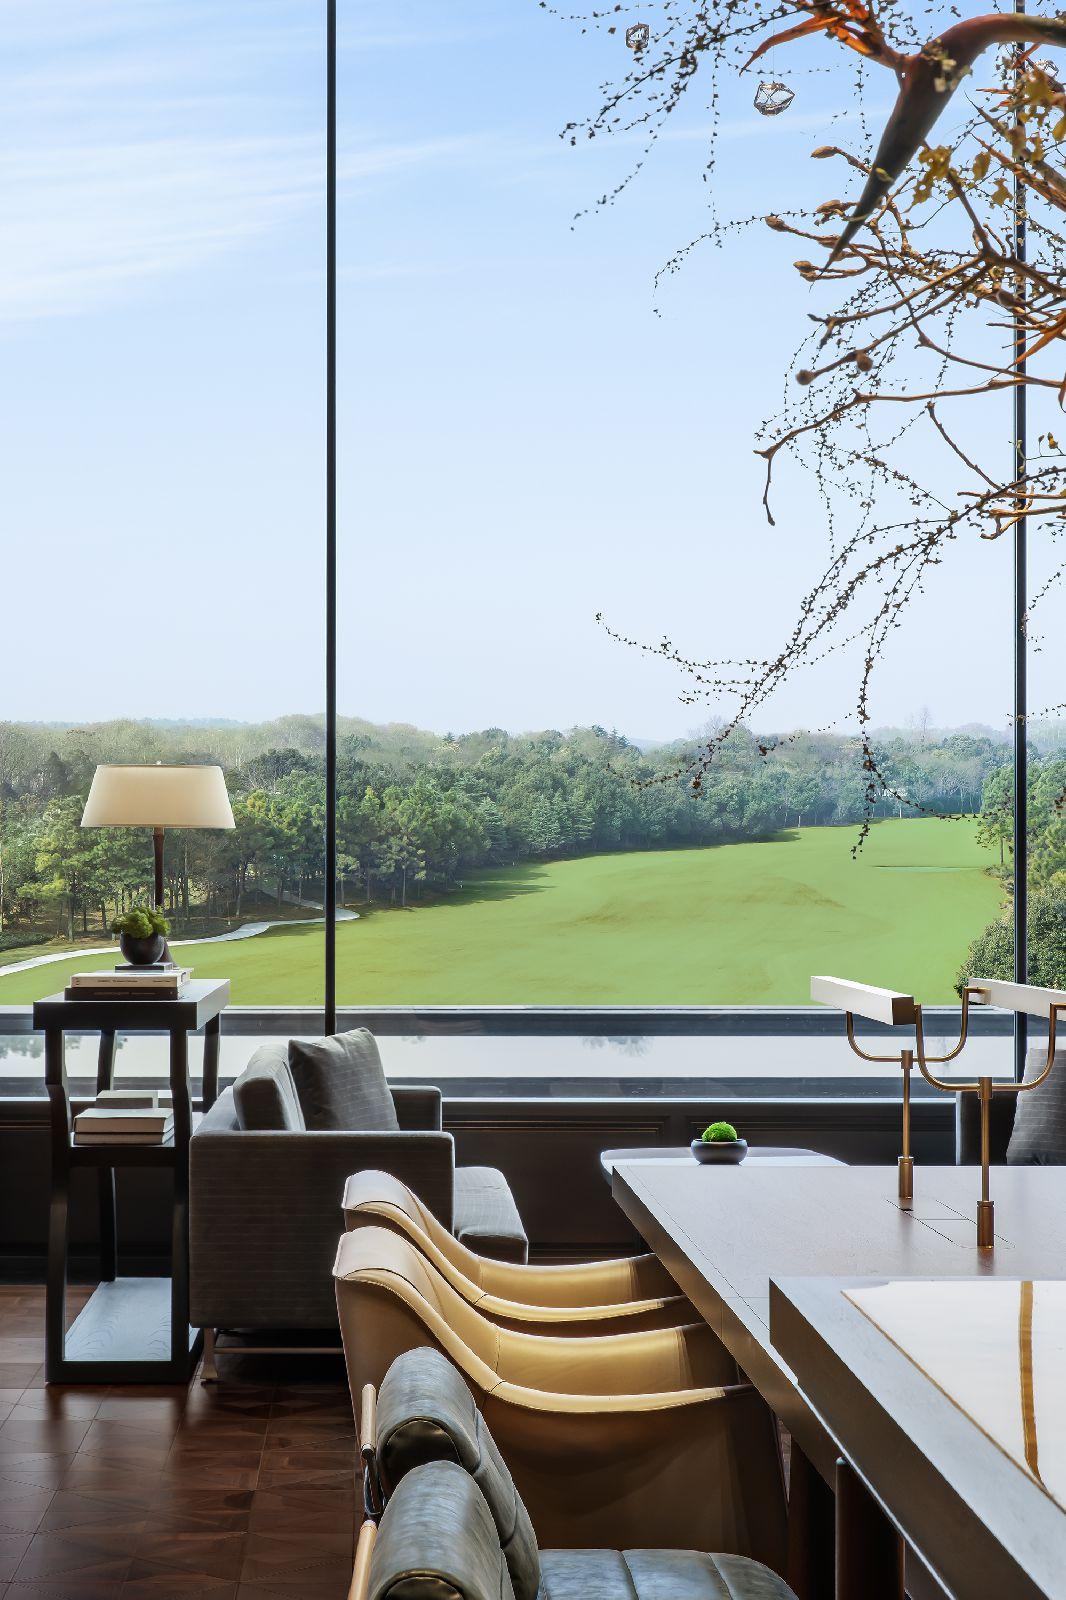 Suning Zhongshan Golf Resort